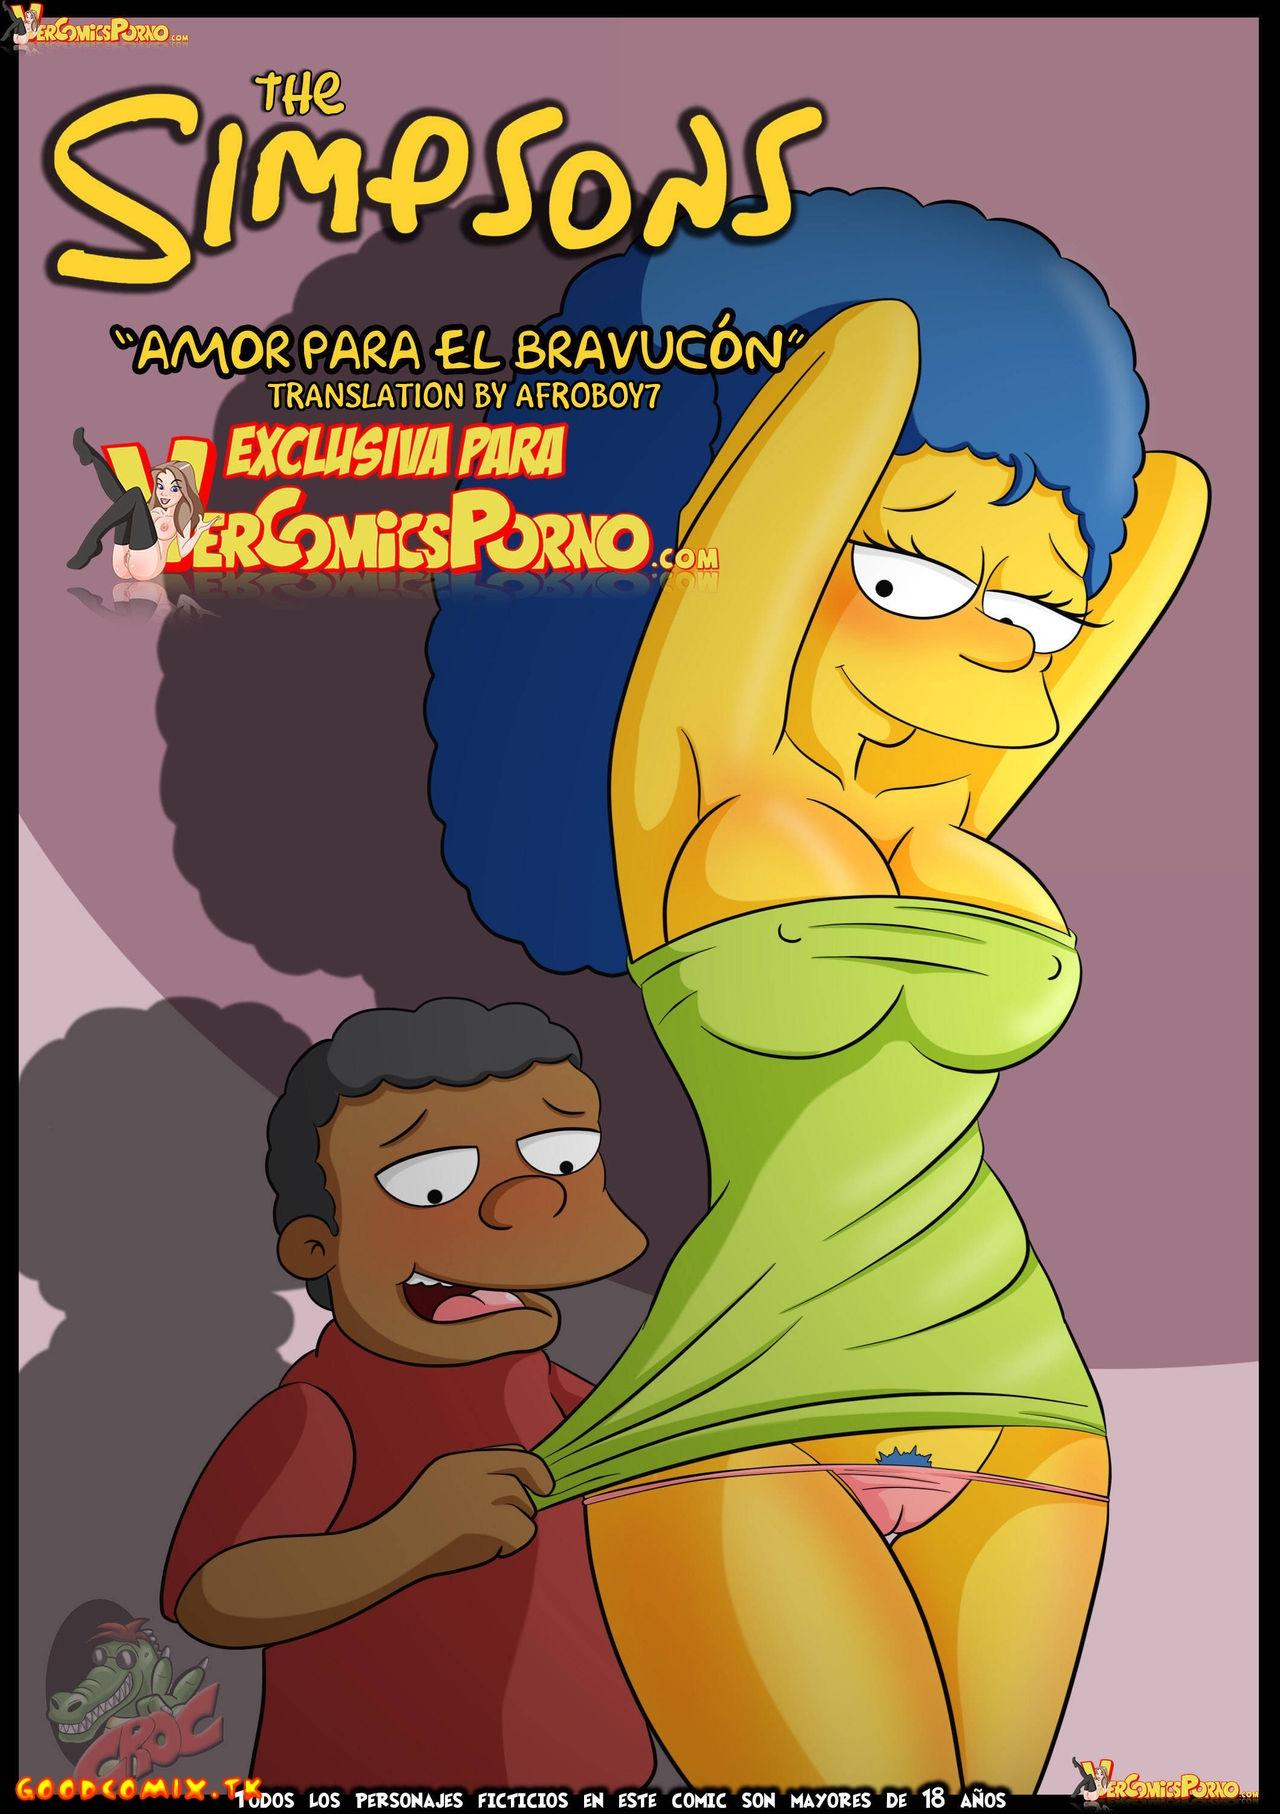 Goodcomix.tk The Simpsons - [VerComicsPorno][Croc] - Amor Para El Bravucón - Love For The Bully